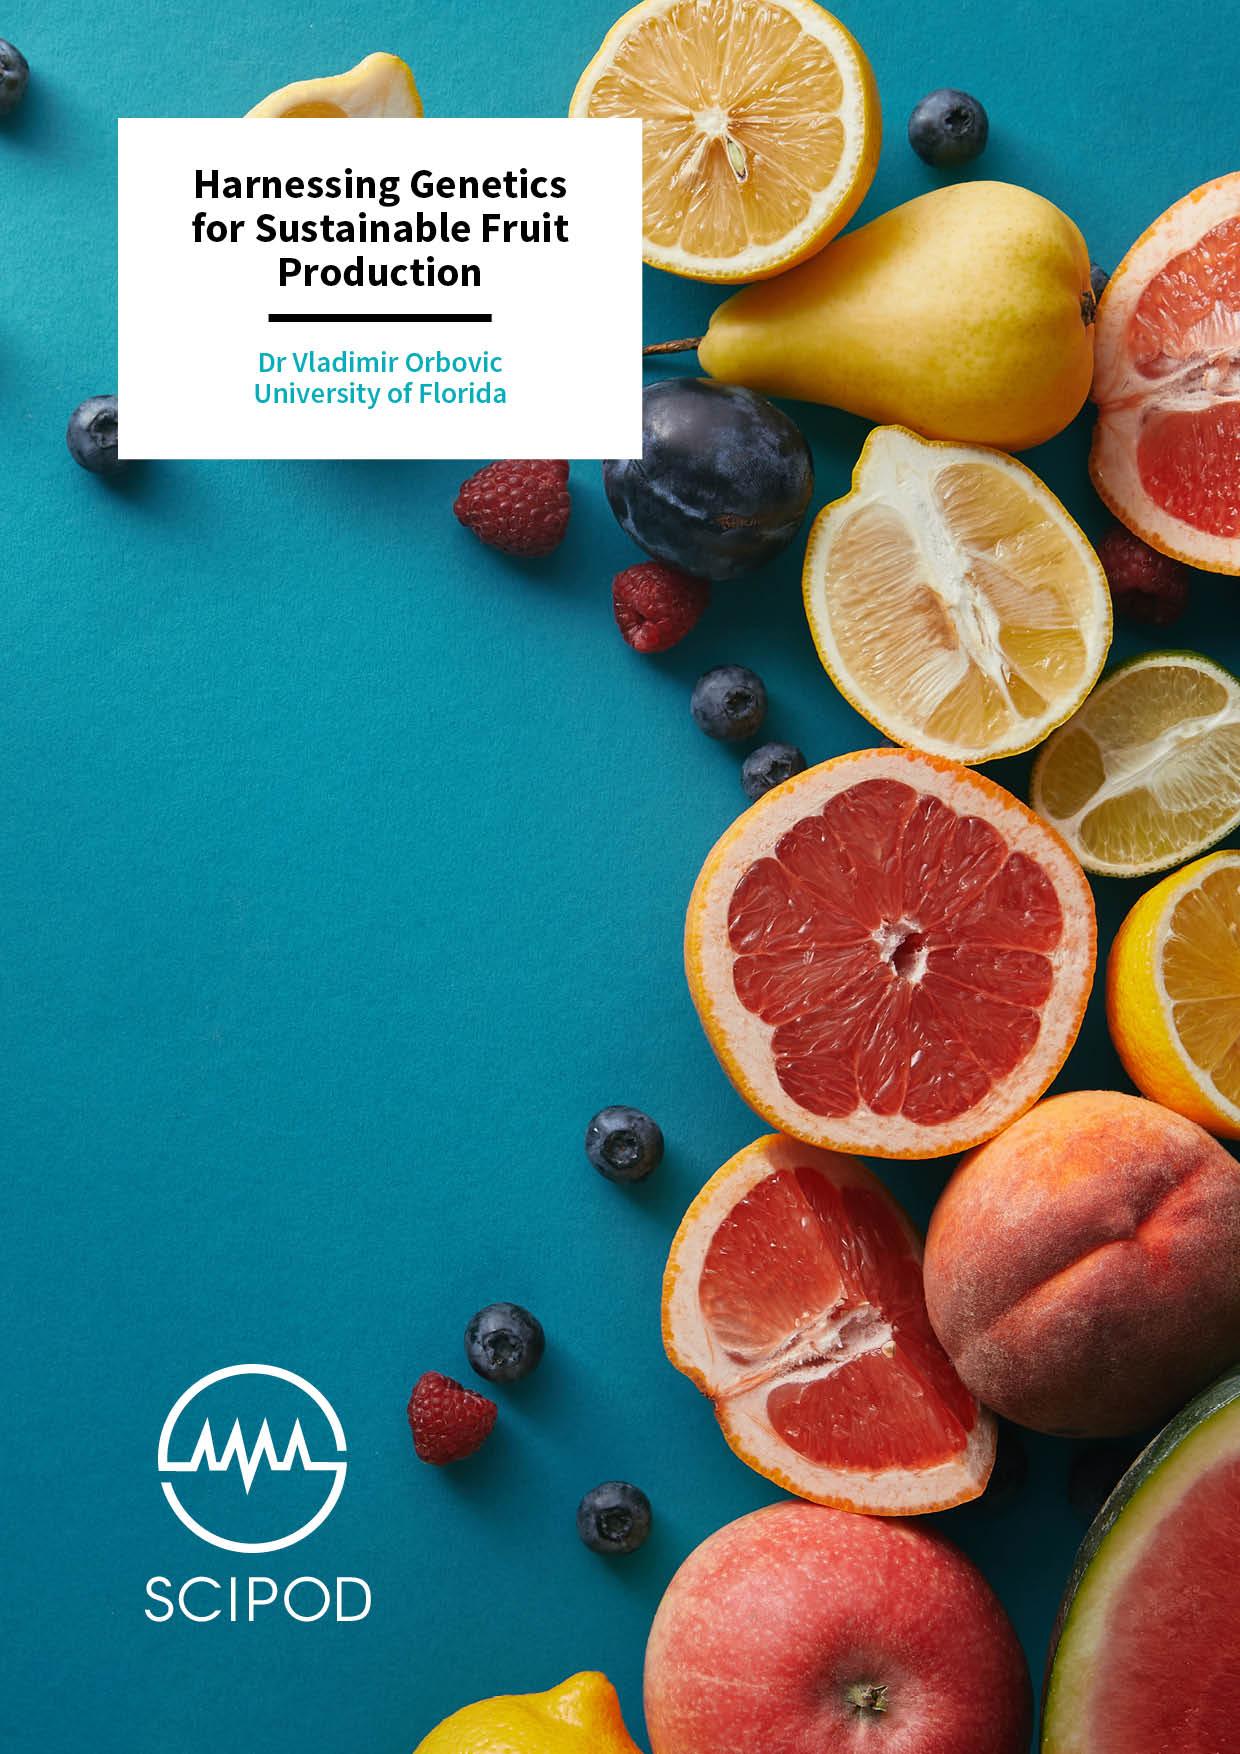 Harnessing Genetics for Sustainable Fruit Production – Dr Vladimir Orbovic, University of Florida